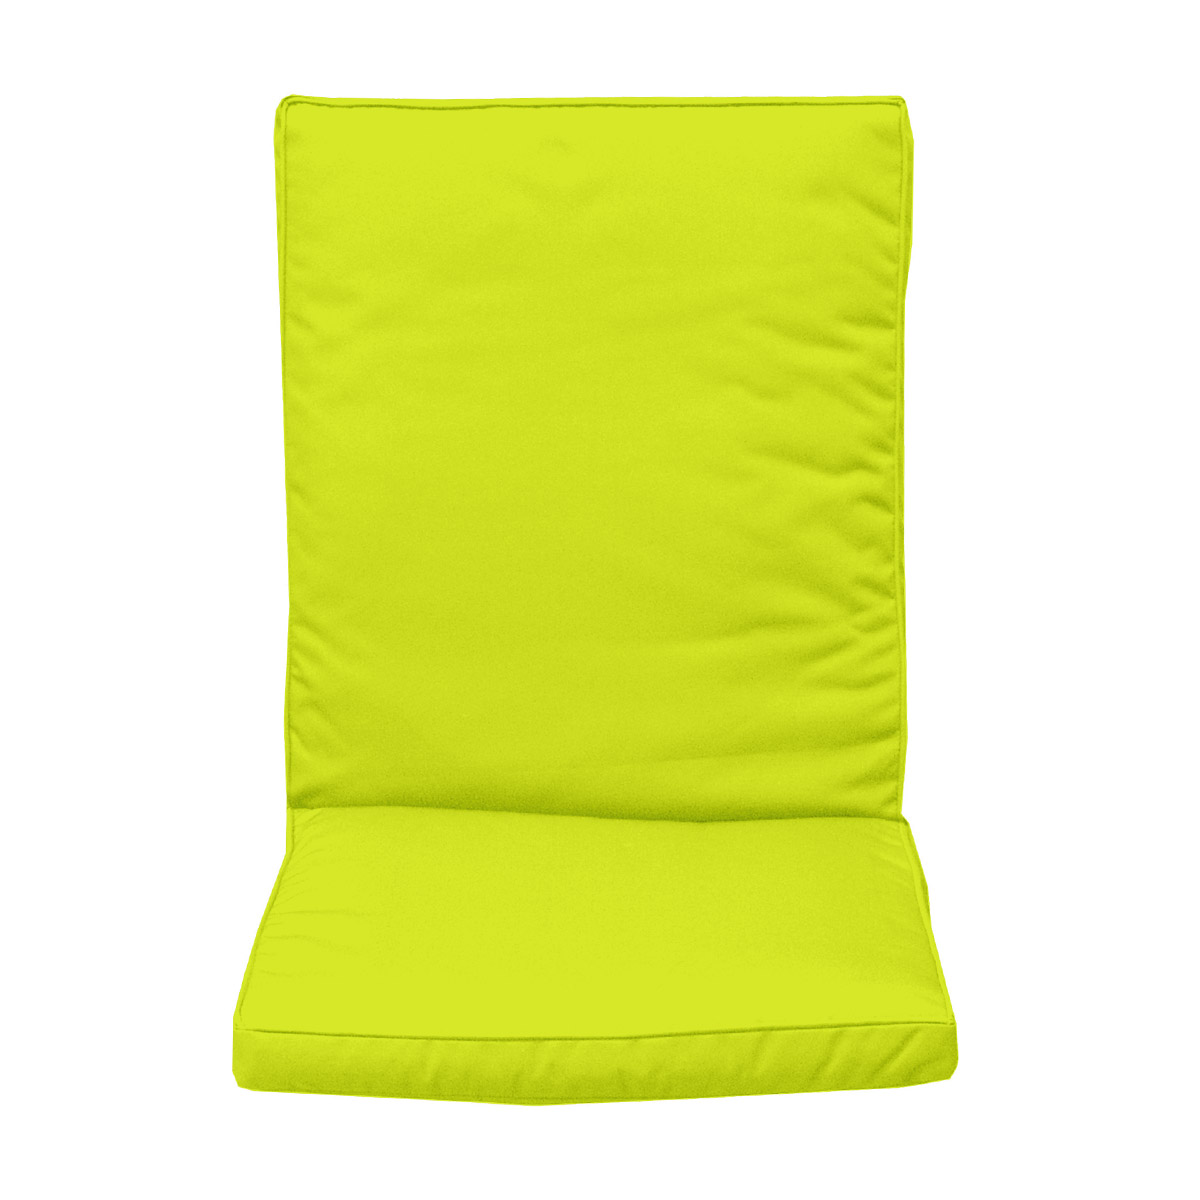 jardin coussins ou fauteuil. Black Bedroom Furniture Sets. Home Design Ideas